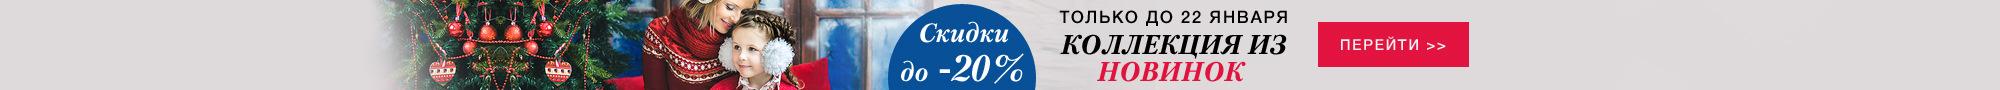 Скидки до 20% на Коллекцию новинок